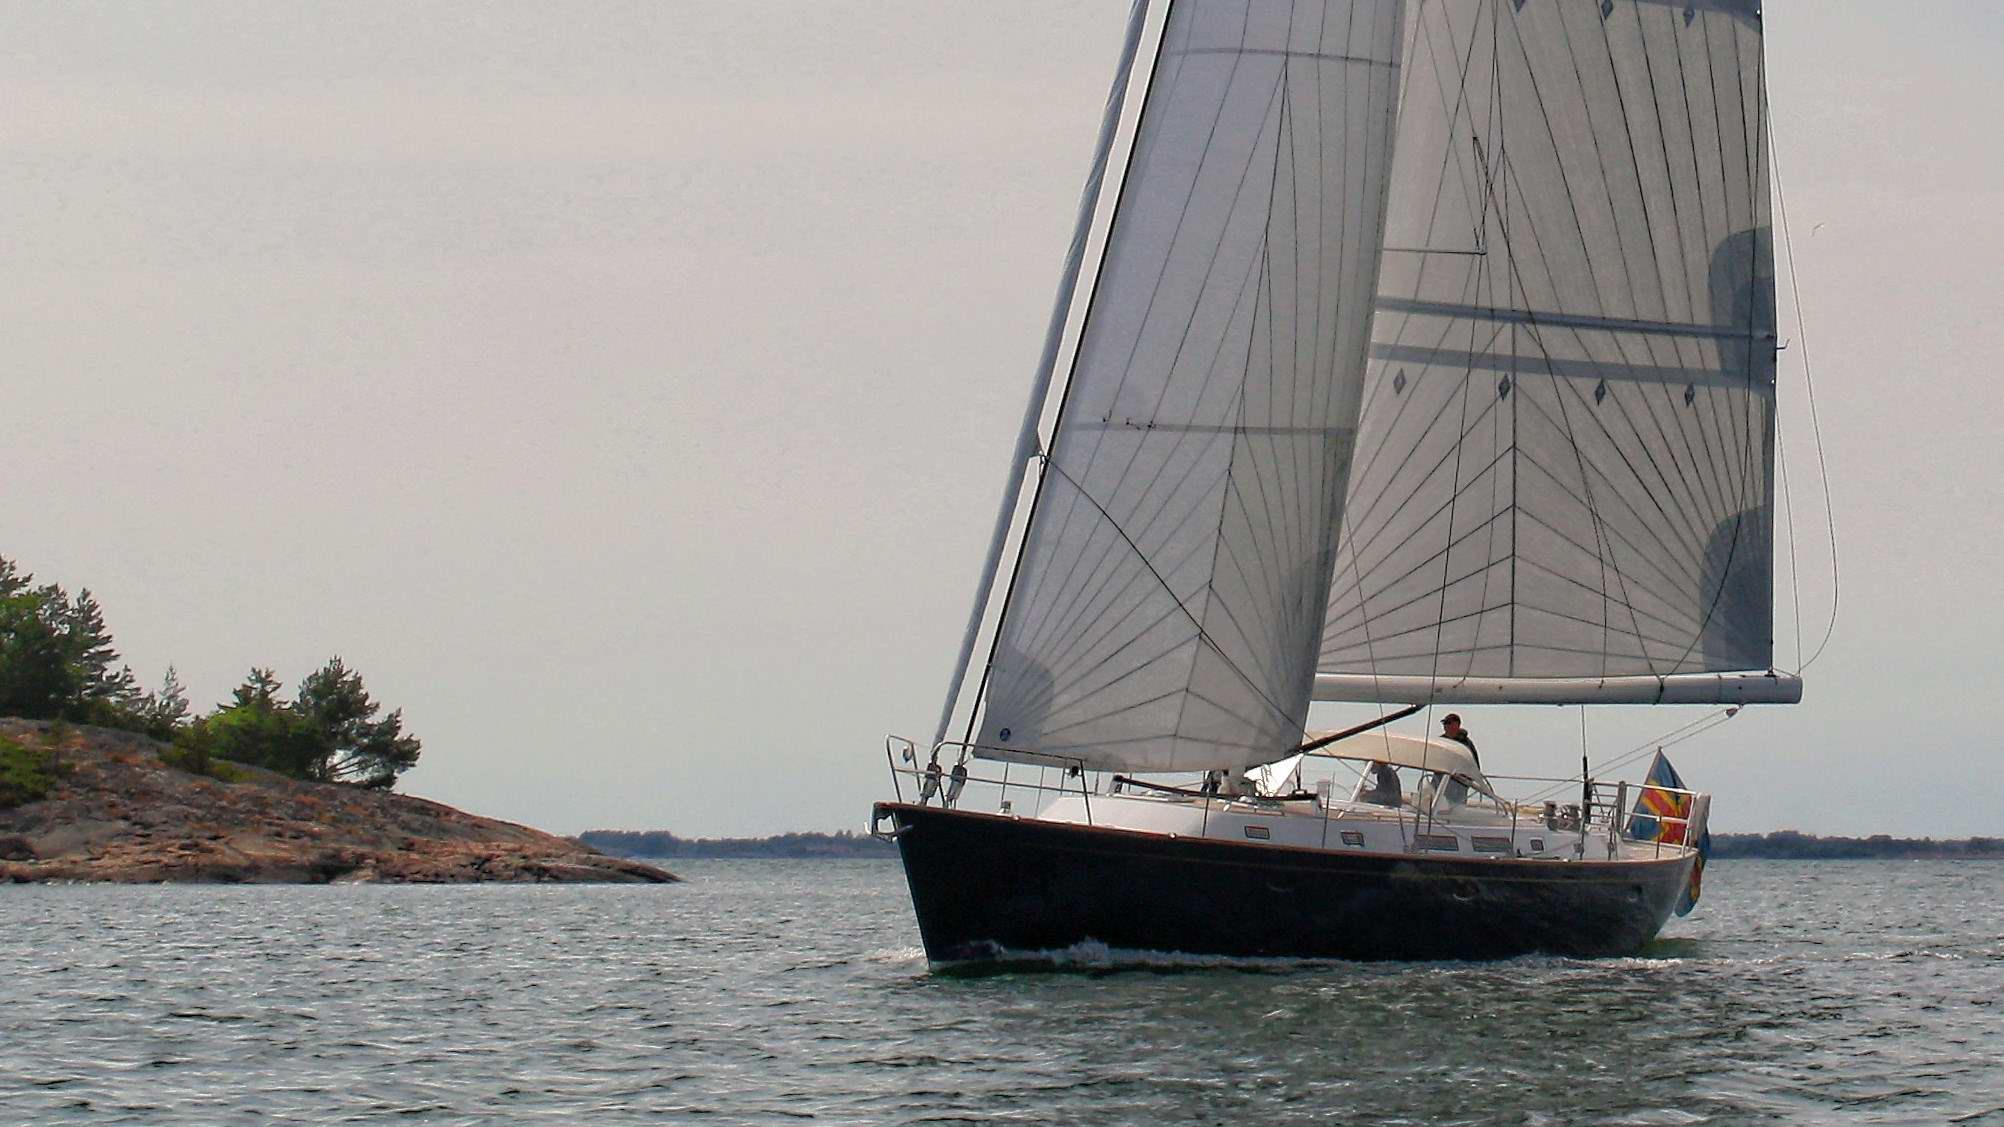 Heyman 57' in the Baltic